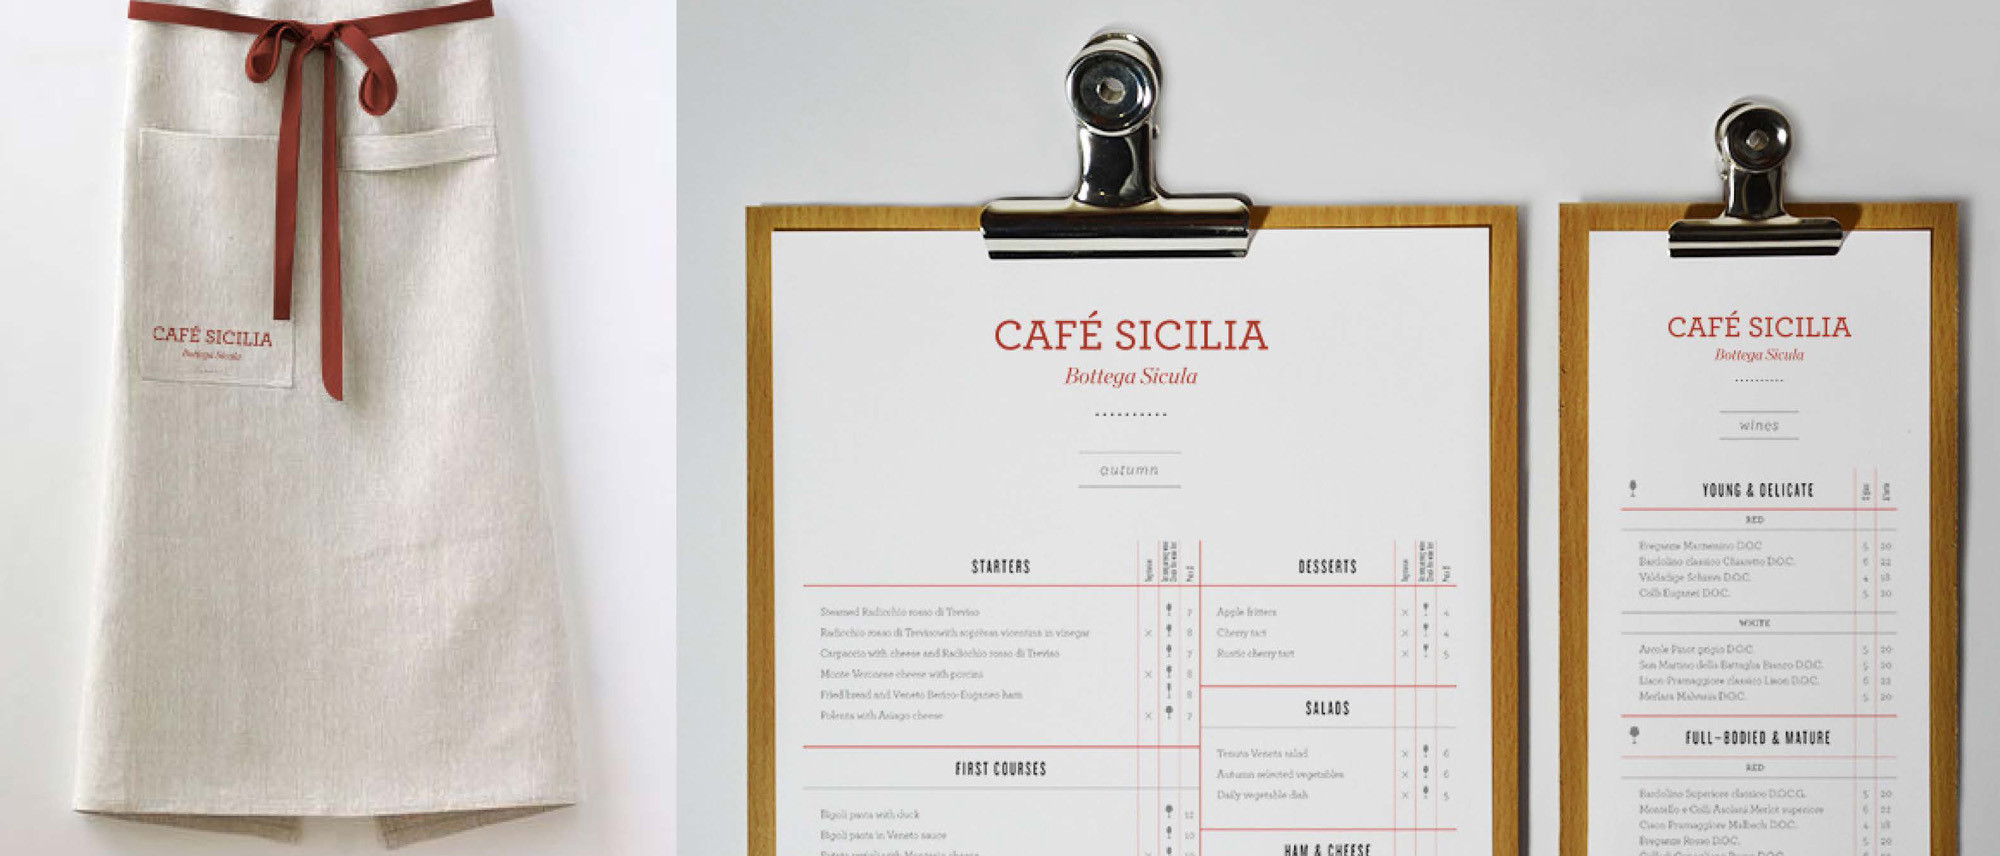 Cafe sicilia branding 2